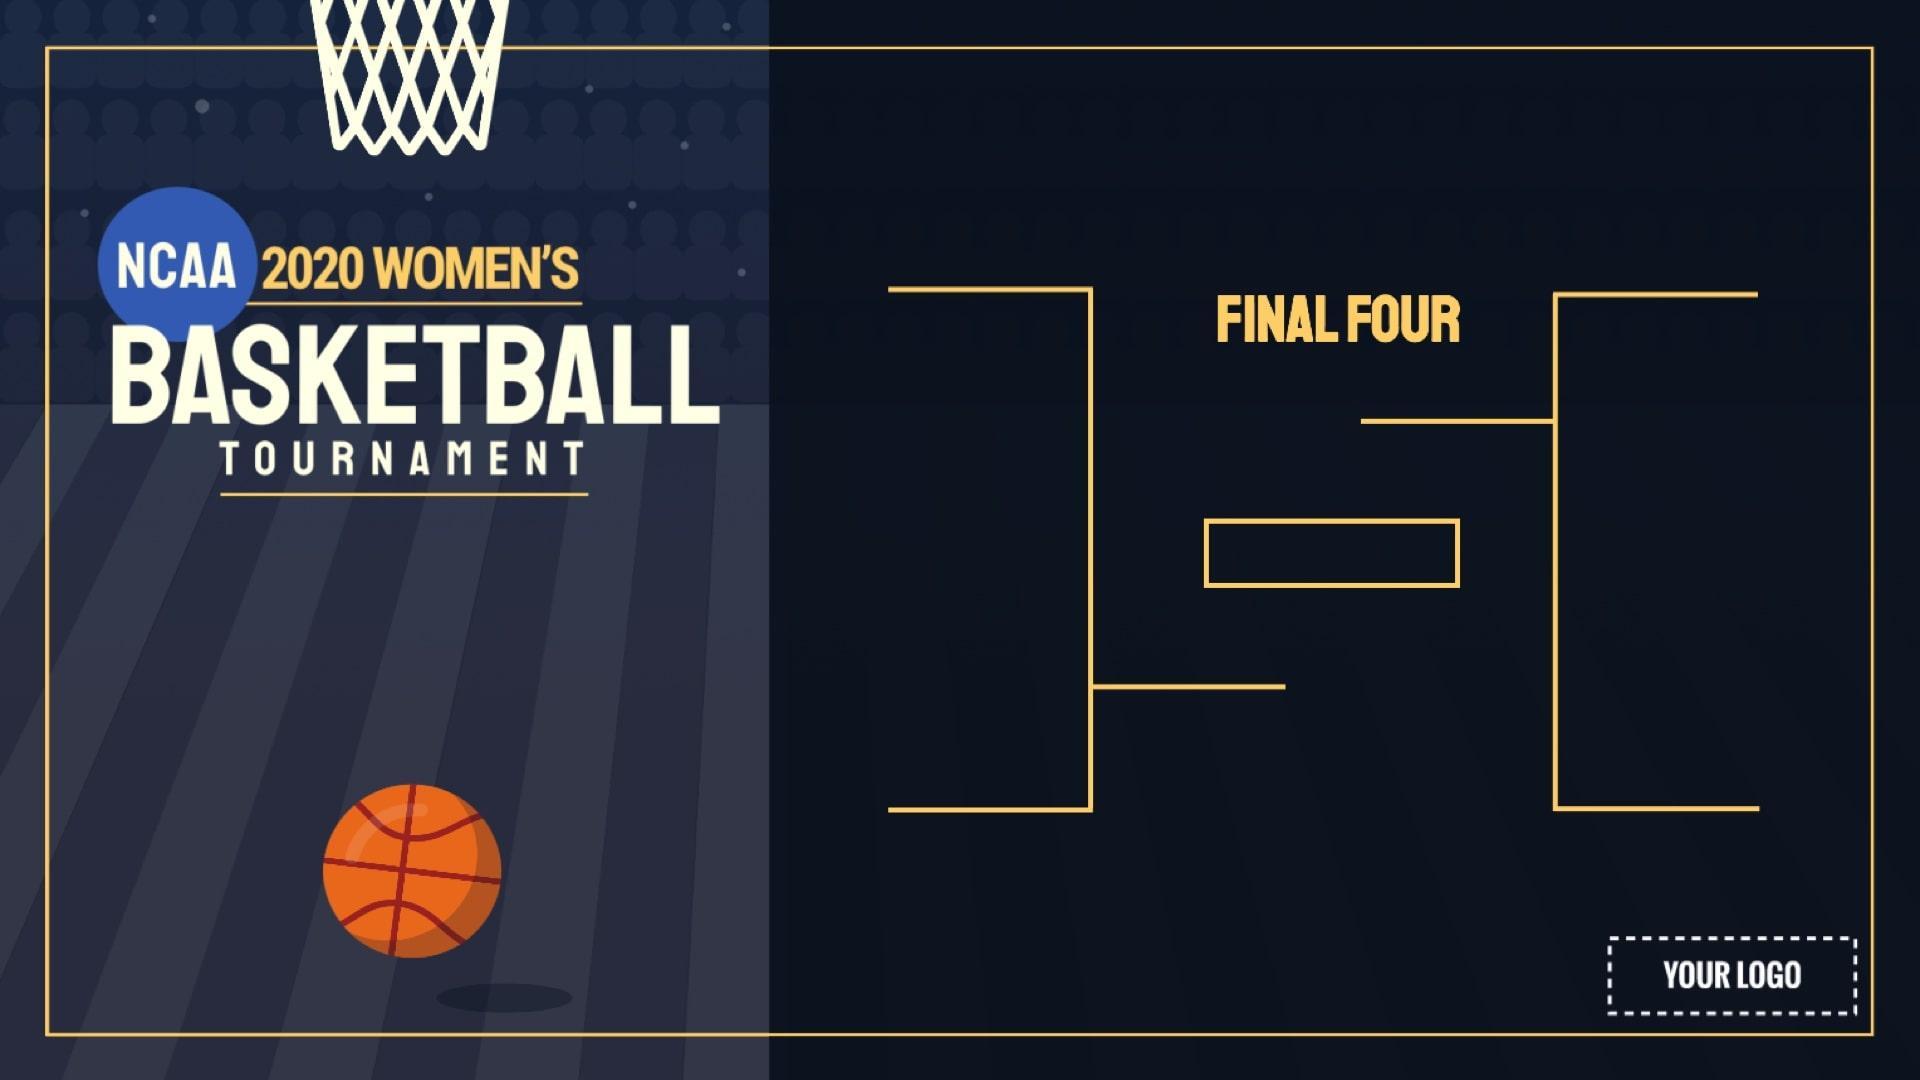 2020 NCAA Women's Tournament Digital Signage Template